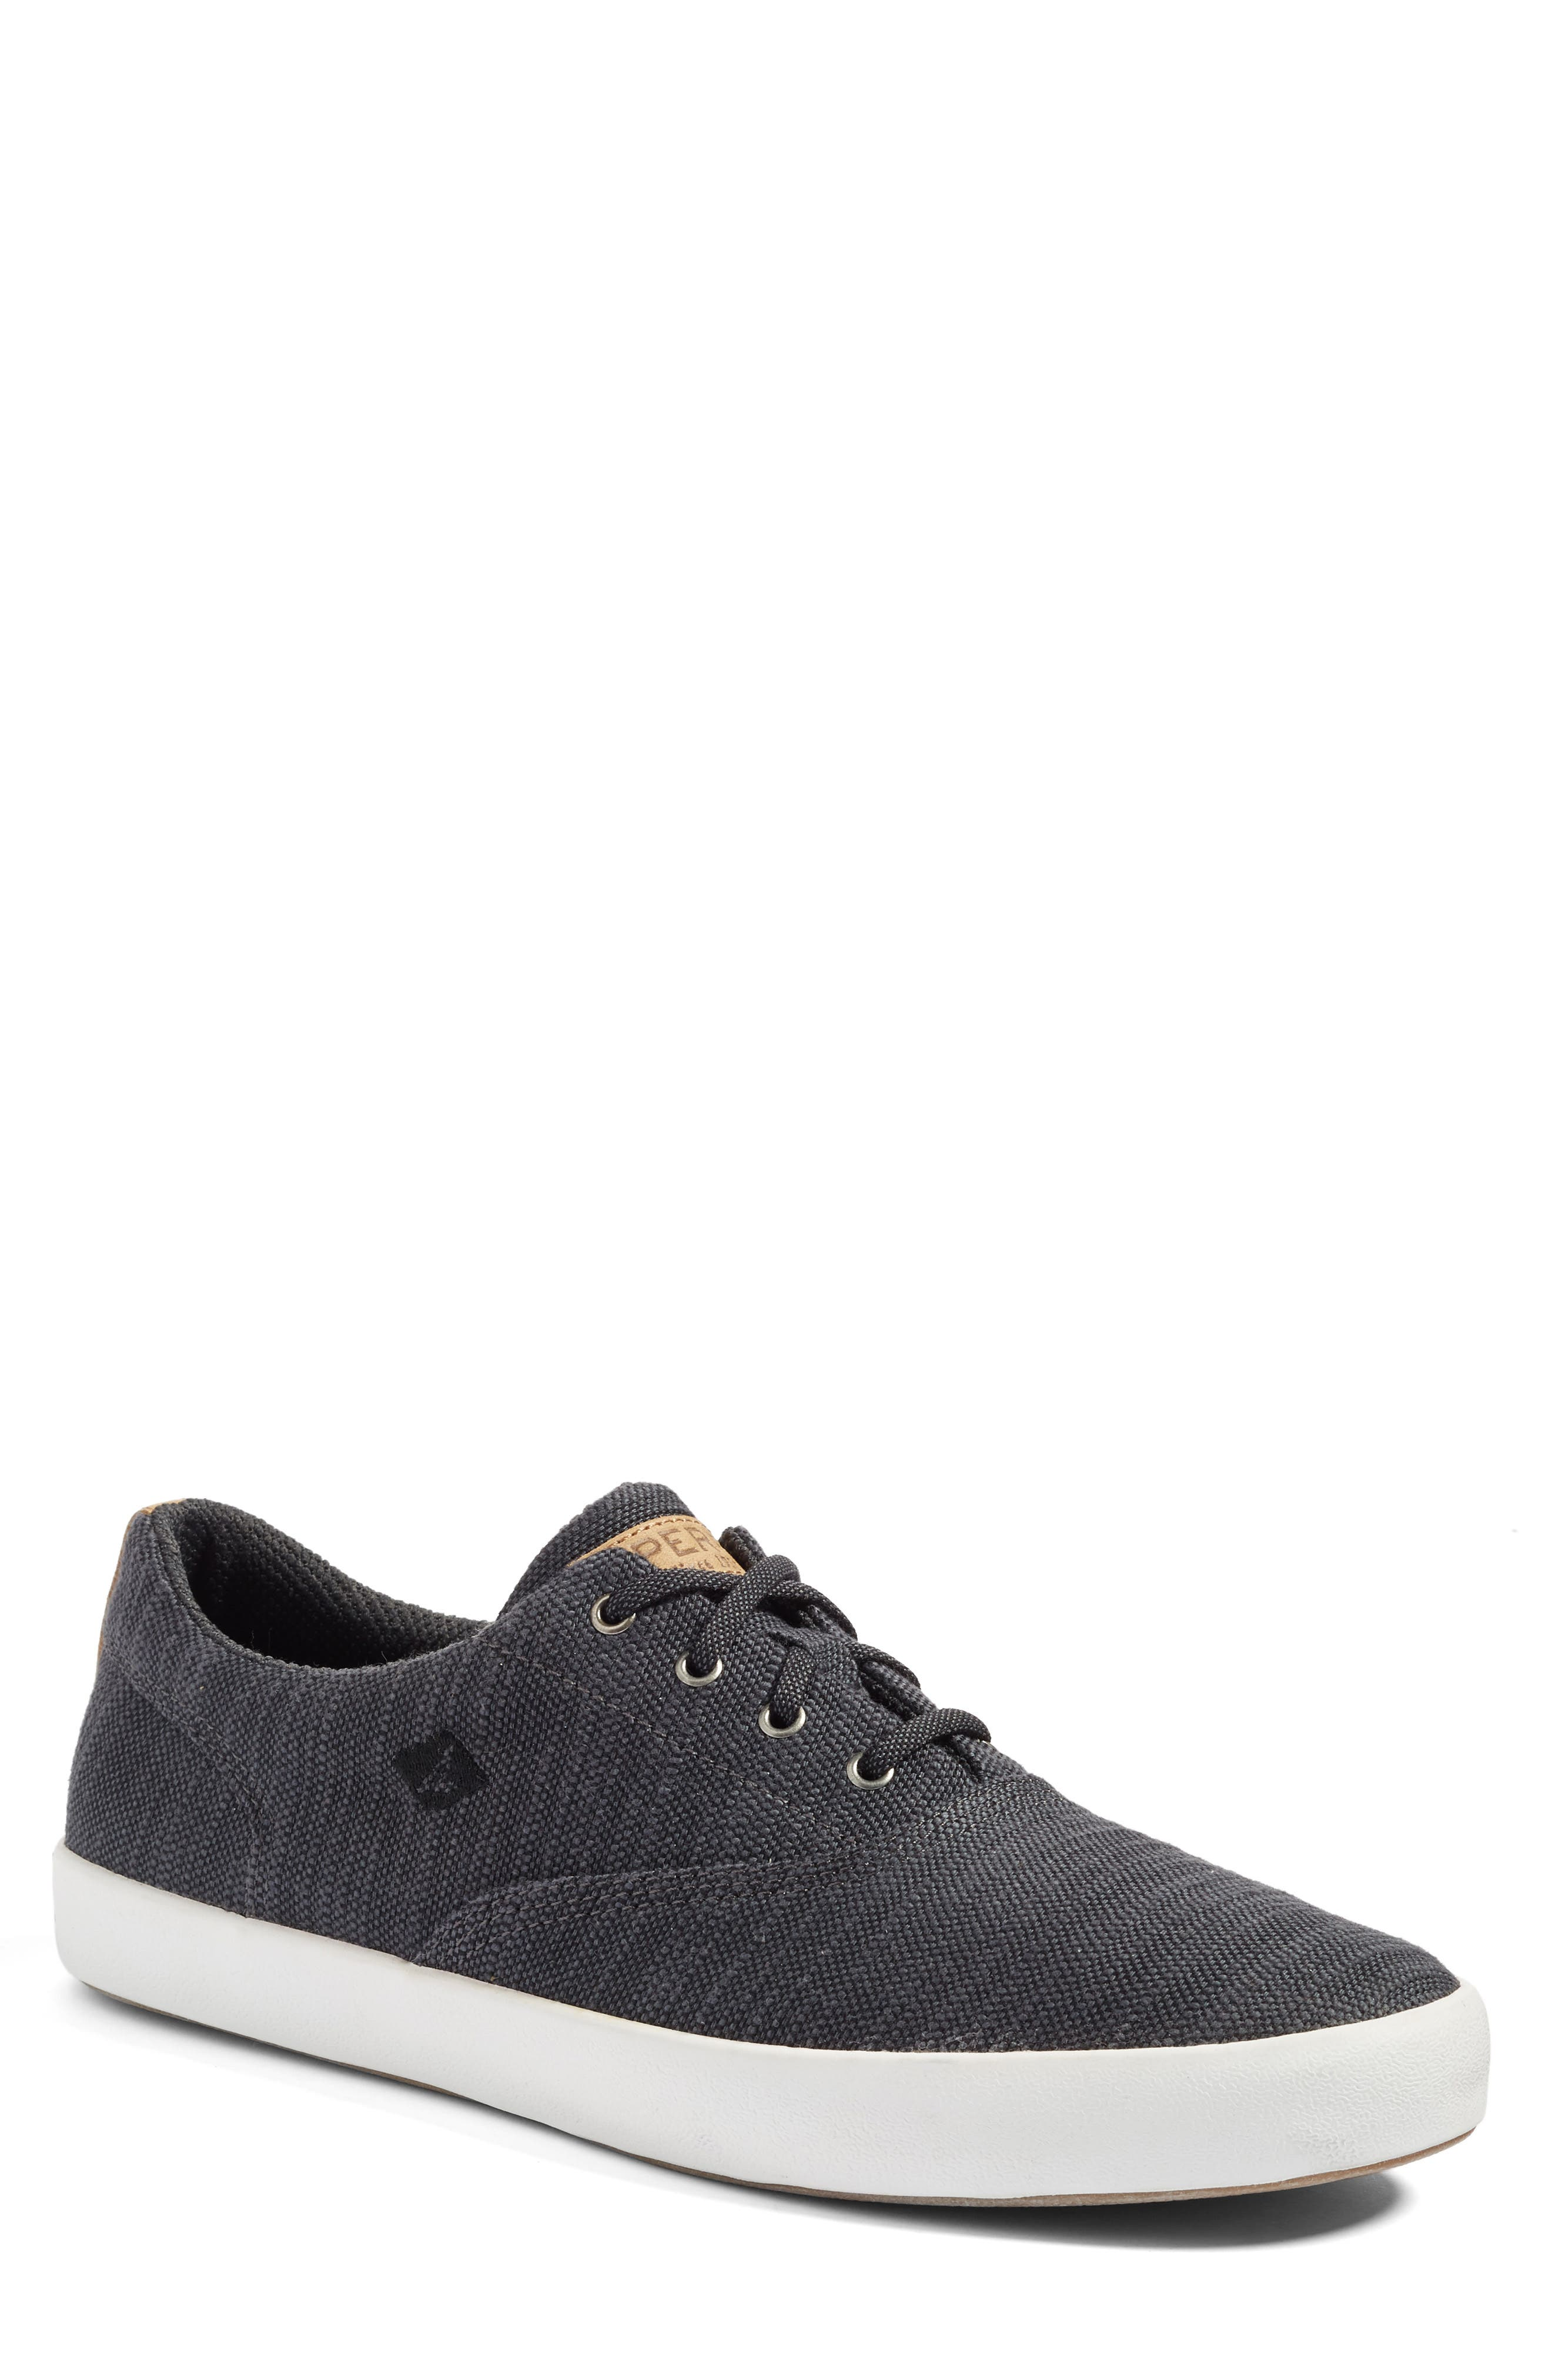 SPERRY,                             Wahoo CVO Baja Sneaker,                             Main thumbnail 1, color,                             020